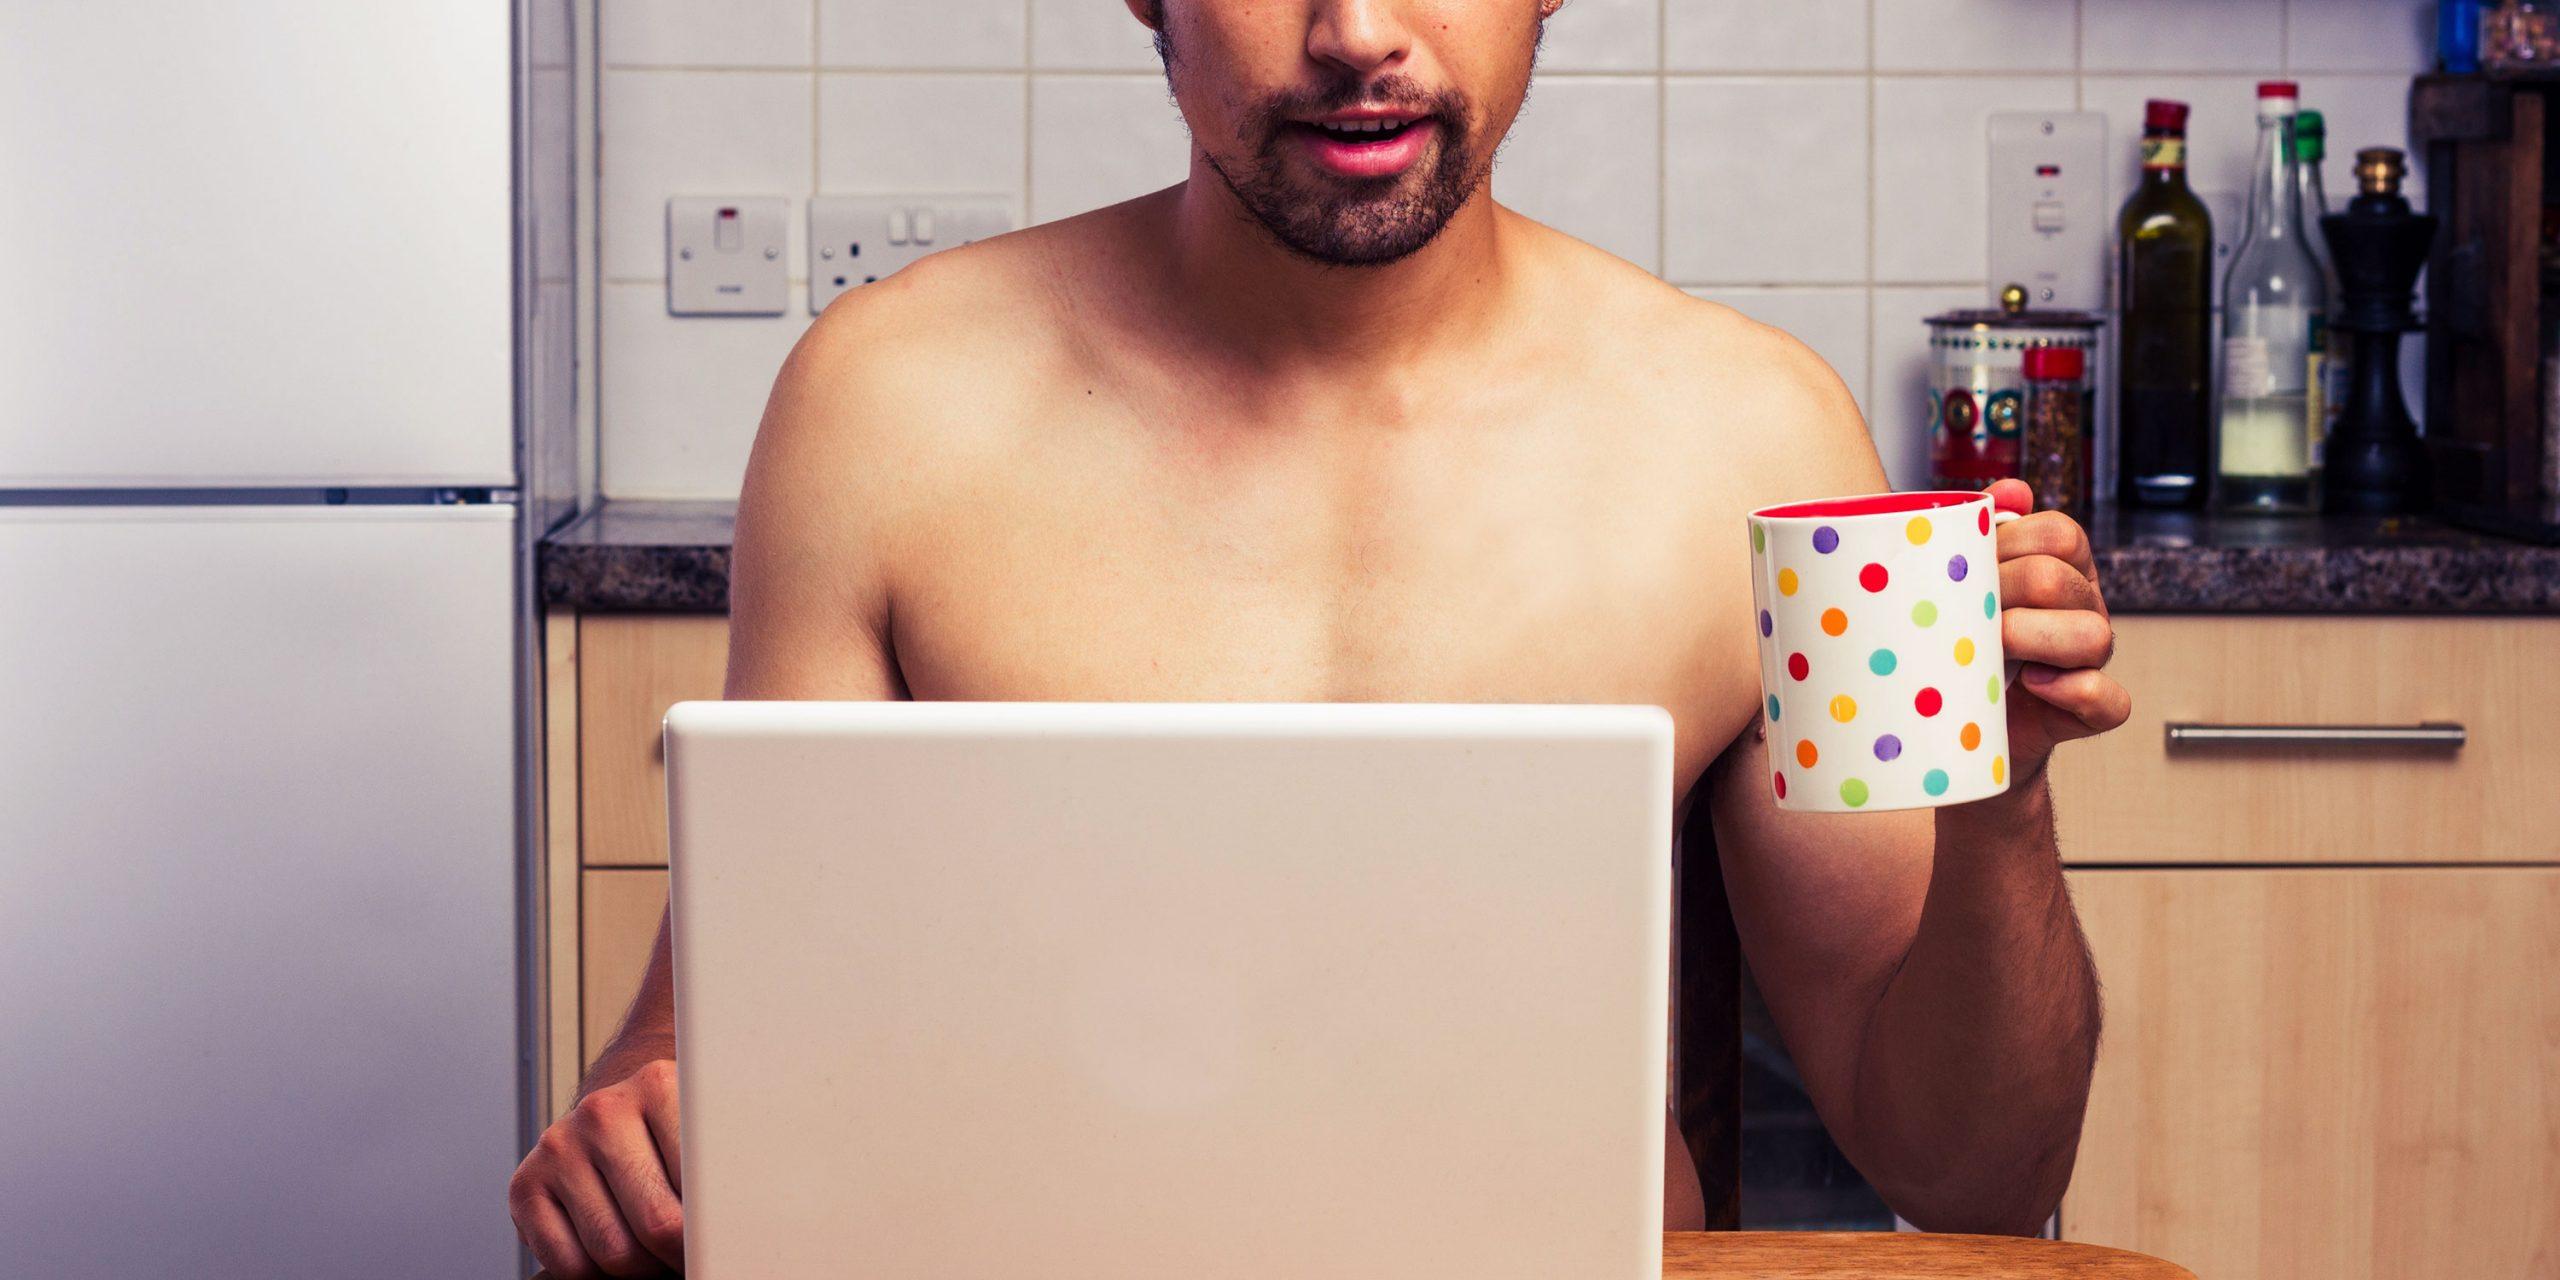 vittime di truffe dating online